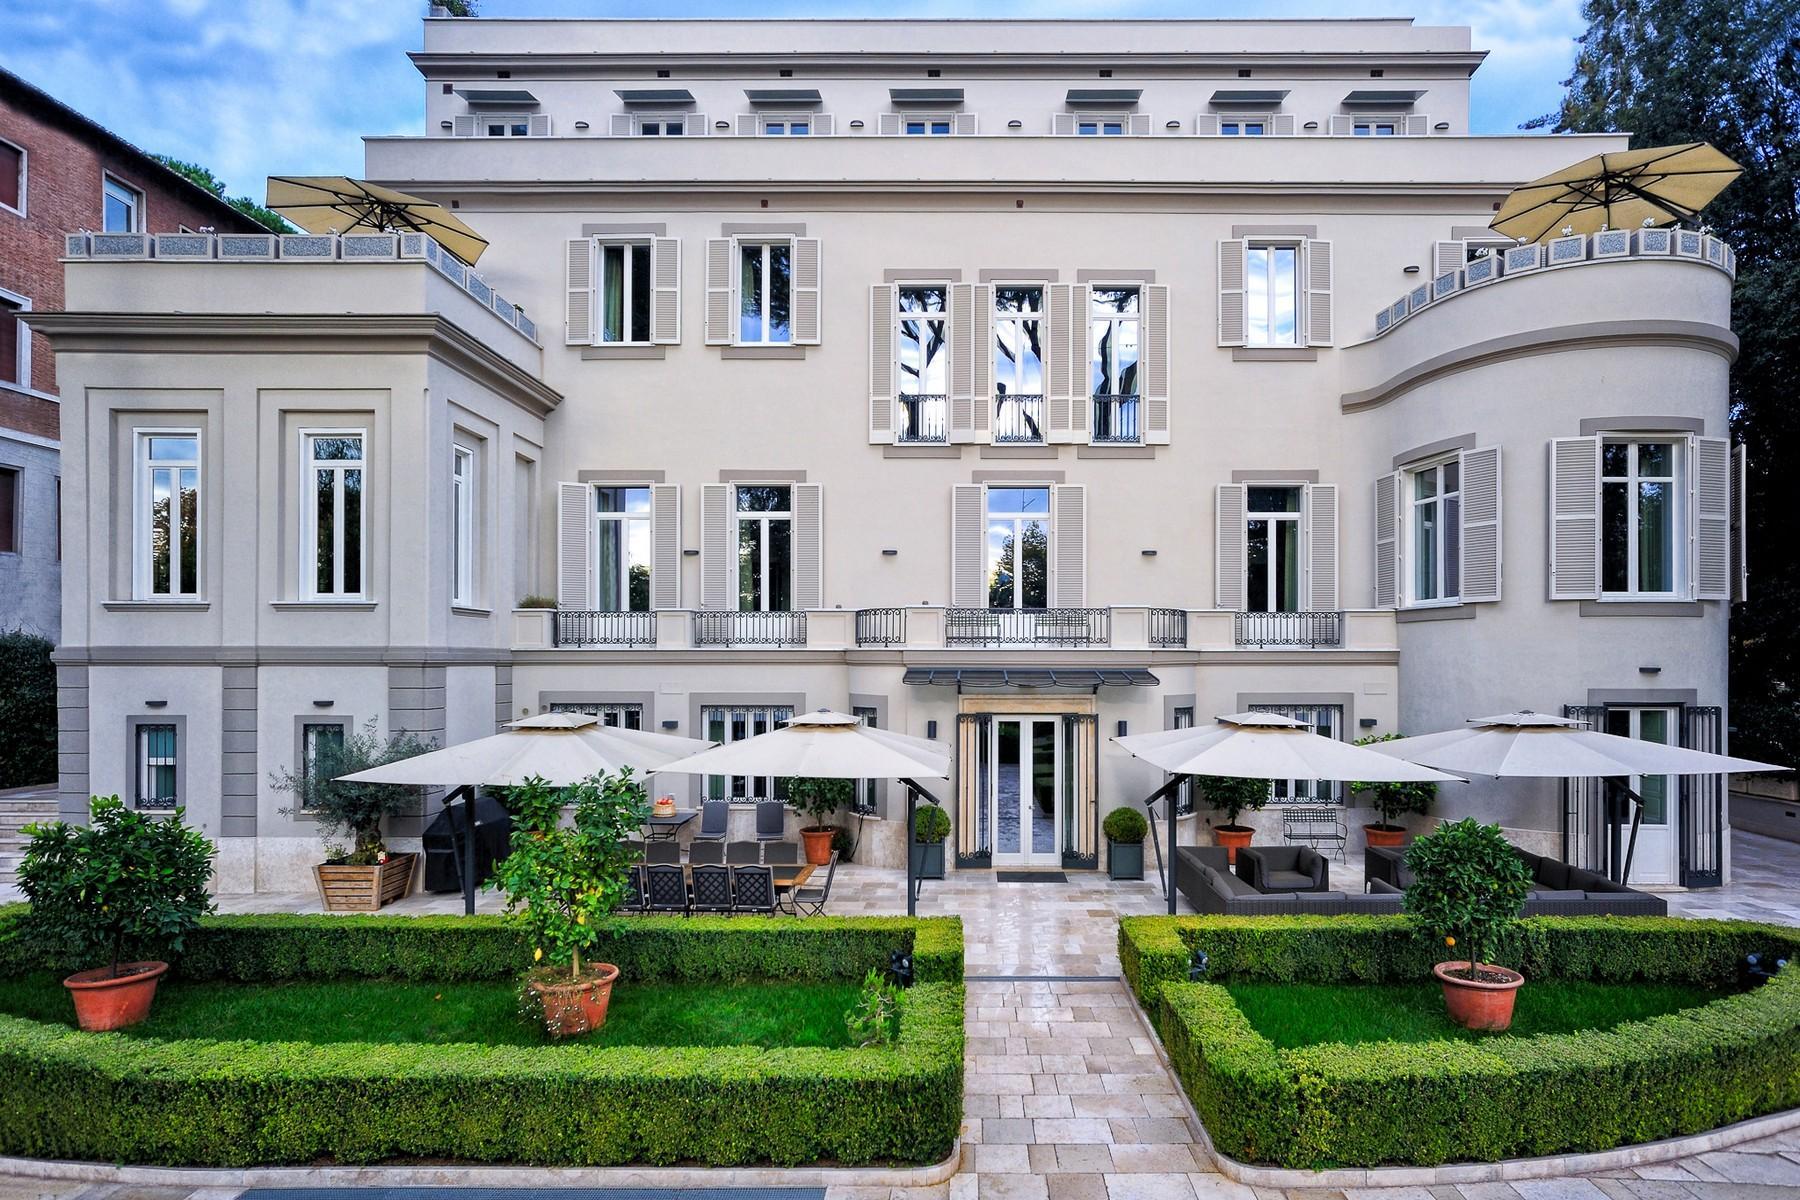 Villa Calandrelli, Charme und Stil im grünen Herzen Roms - 2